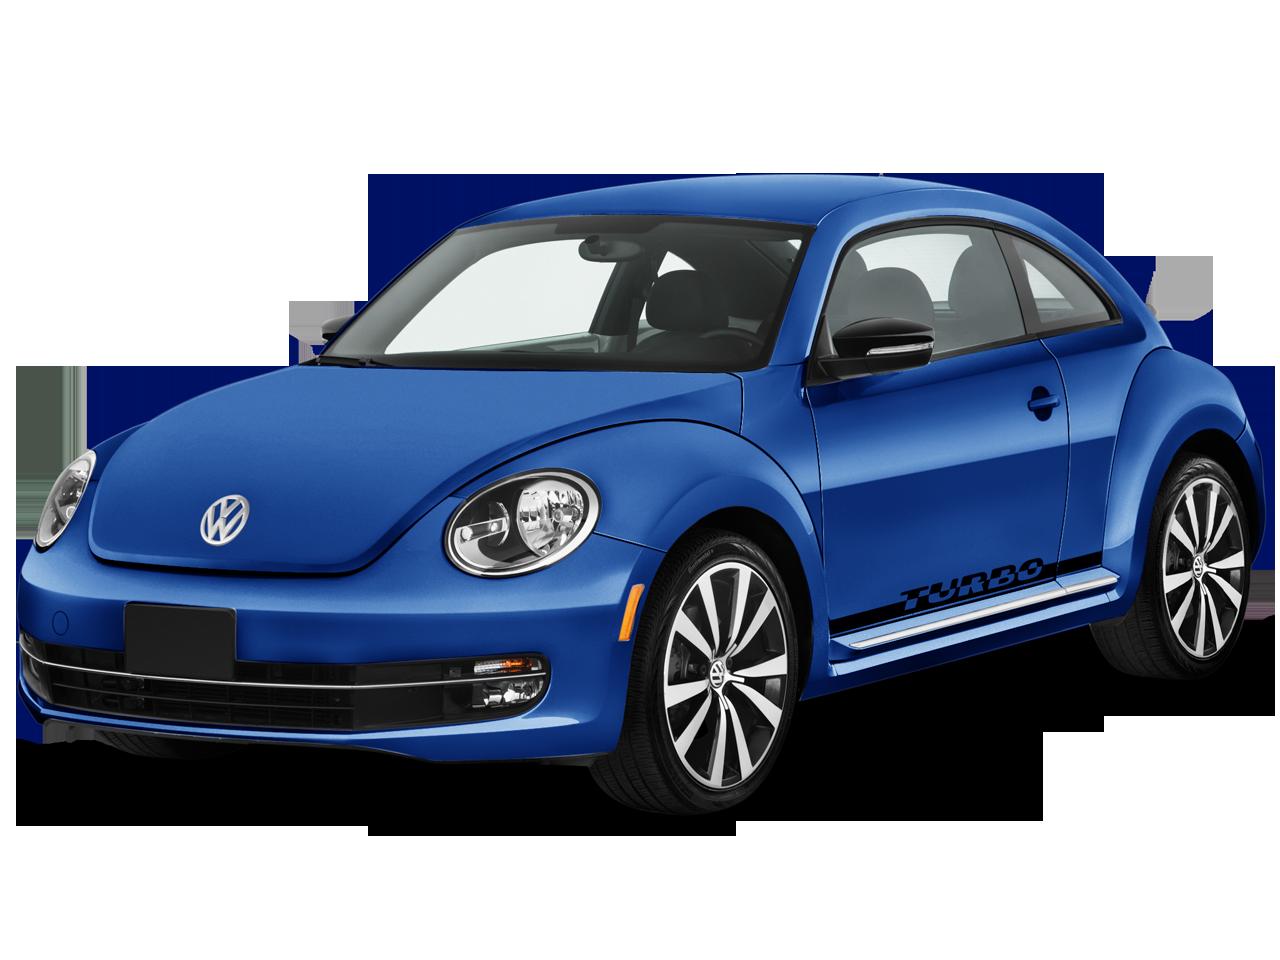 Volkswagen Beetle Orlando Lease Deal On Vw Beetle